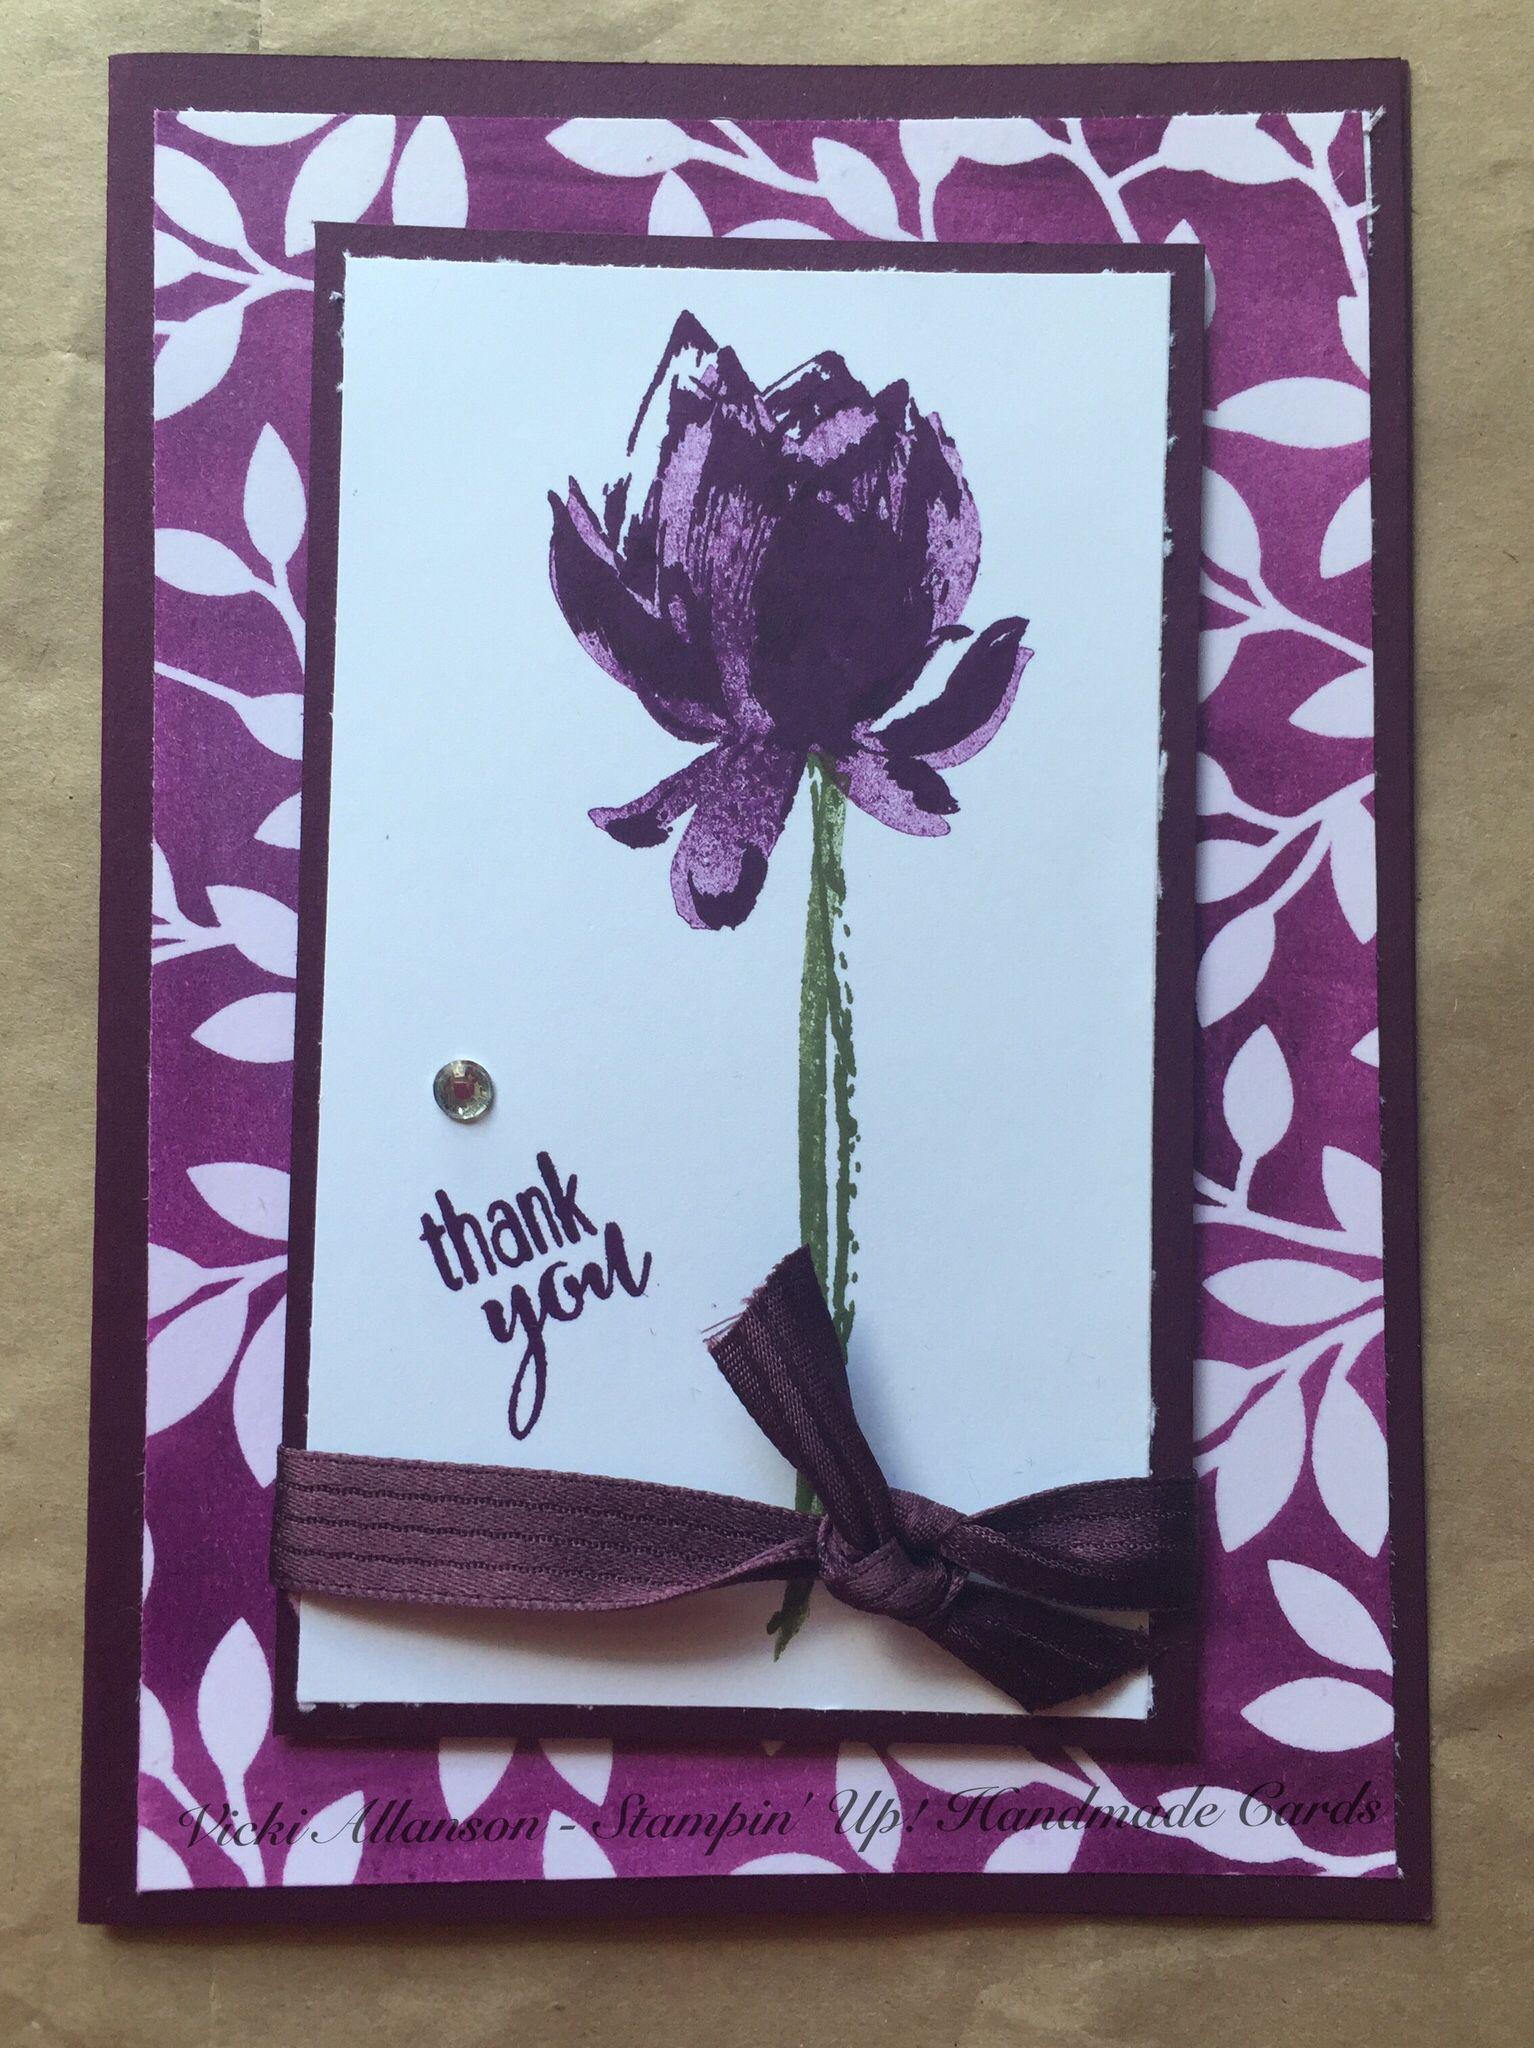 Lotus Flower Sale A Bration 2015 Tarjeta Pinterest Lotus